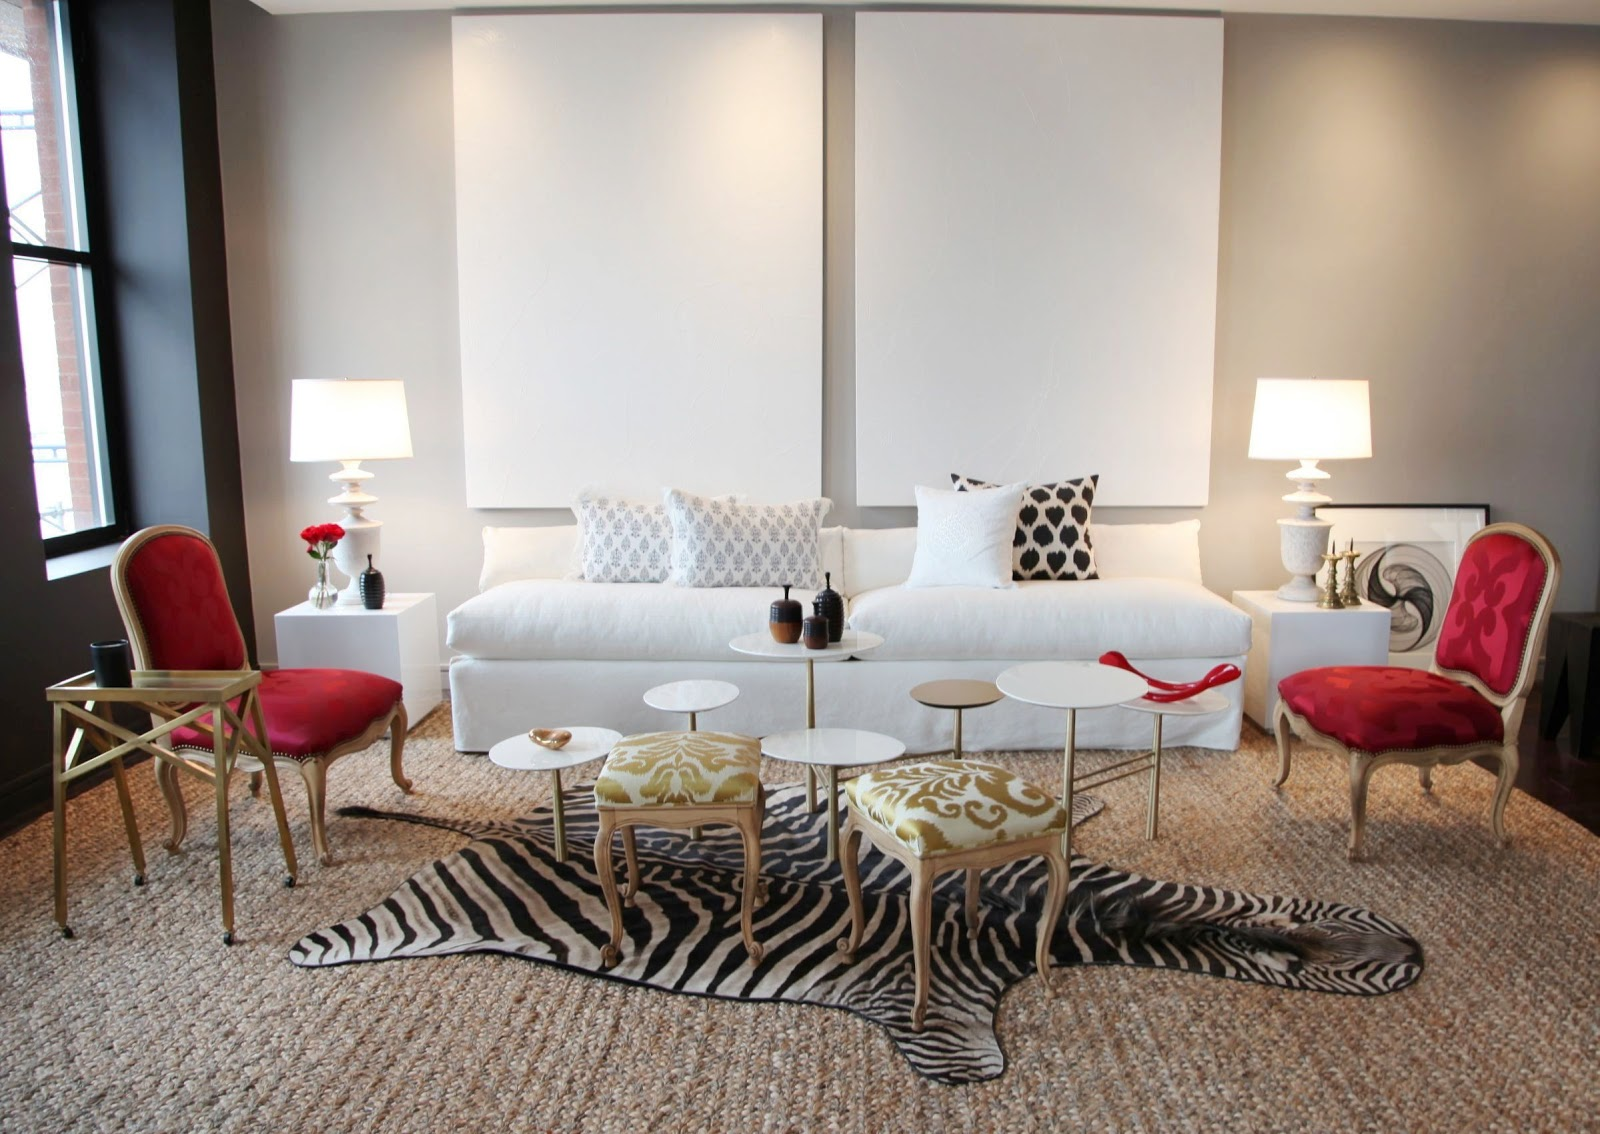 Antony Todd Sofa Black And White Minima Home Hearst Designer Visions